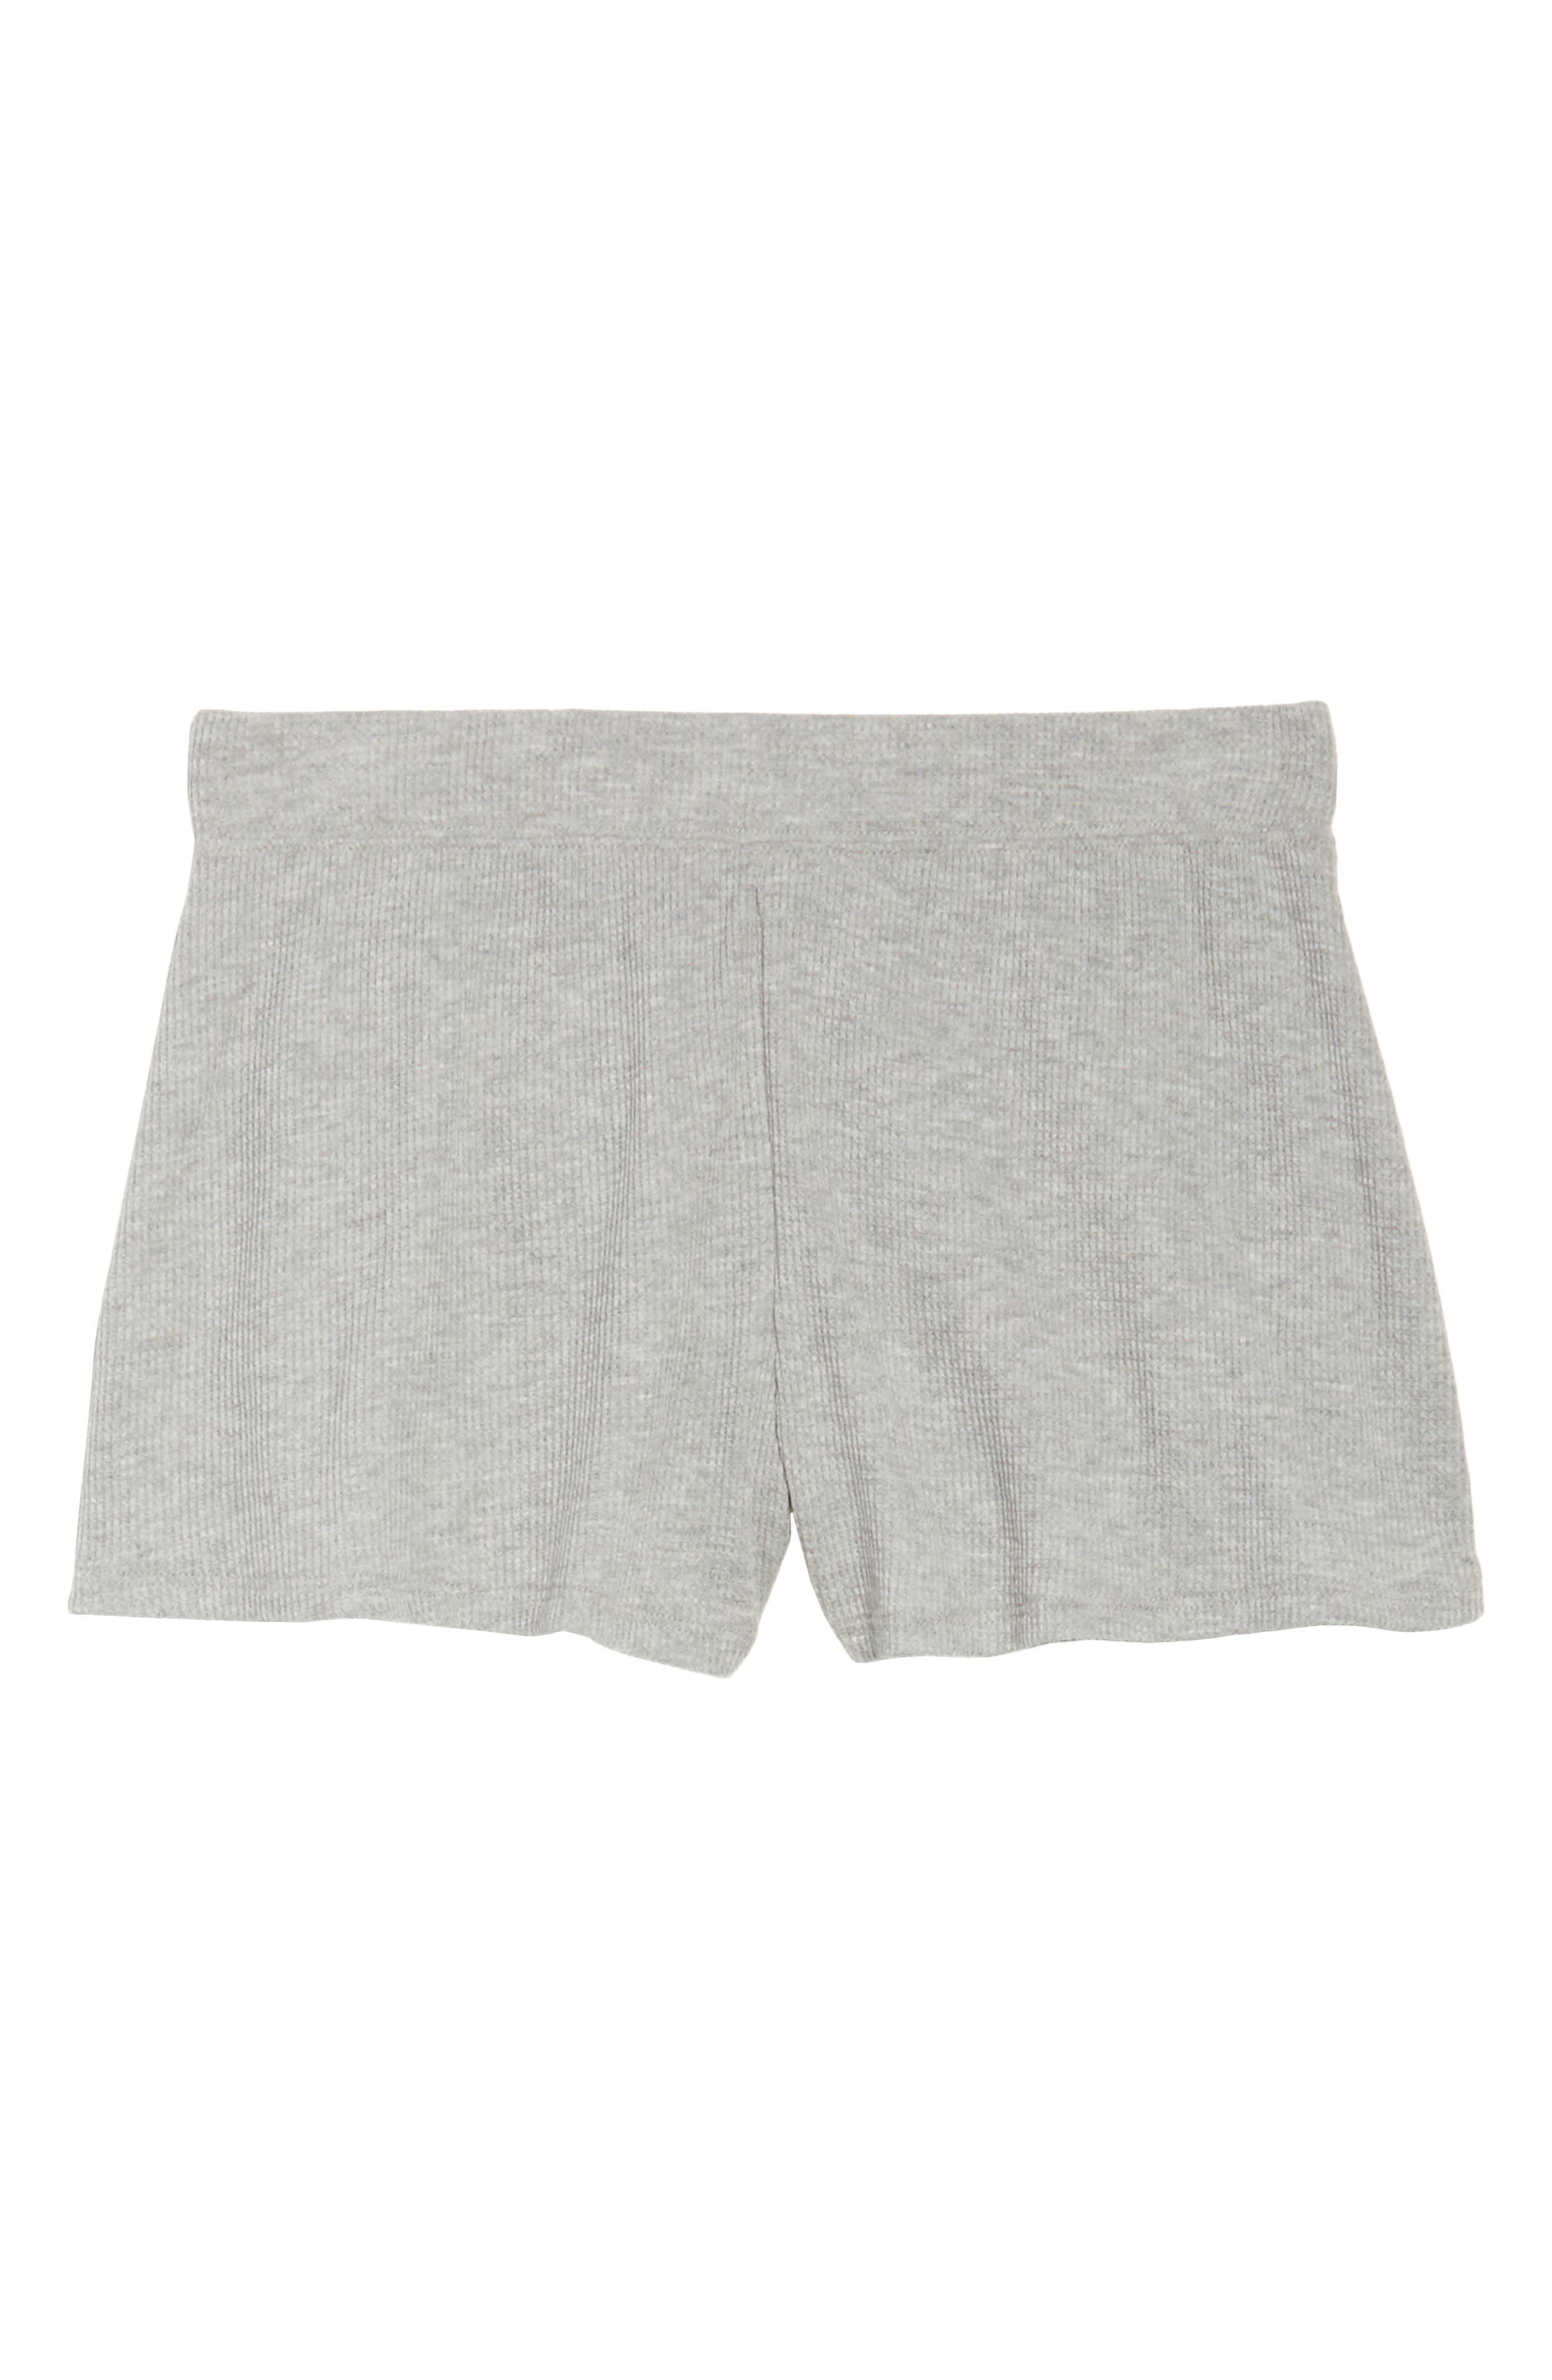 Waffle Knit Lounge Shorts,                             Alternate thumbnail 6, color,                             Heather Grey